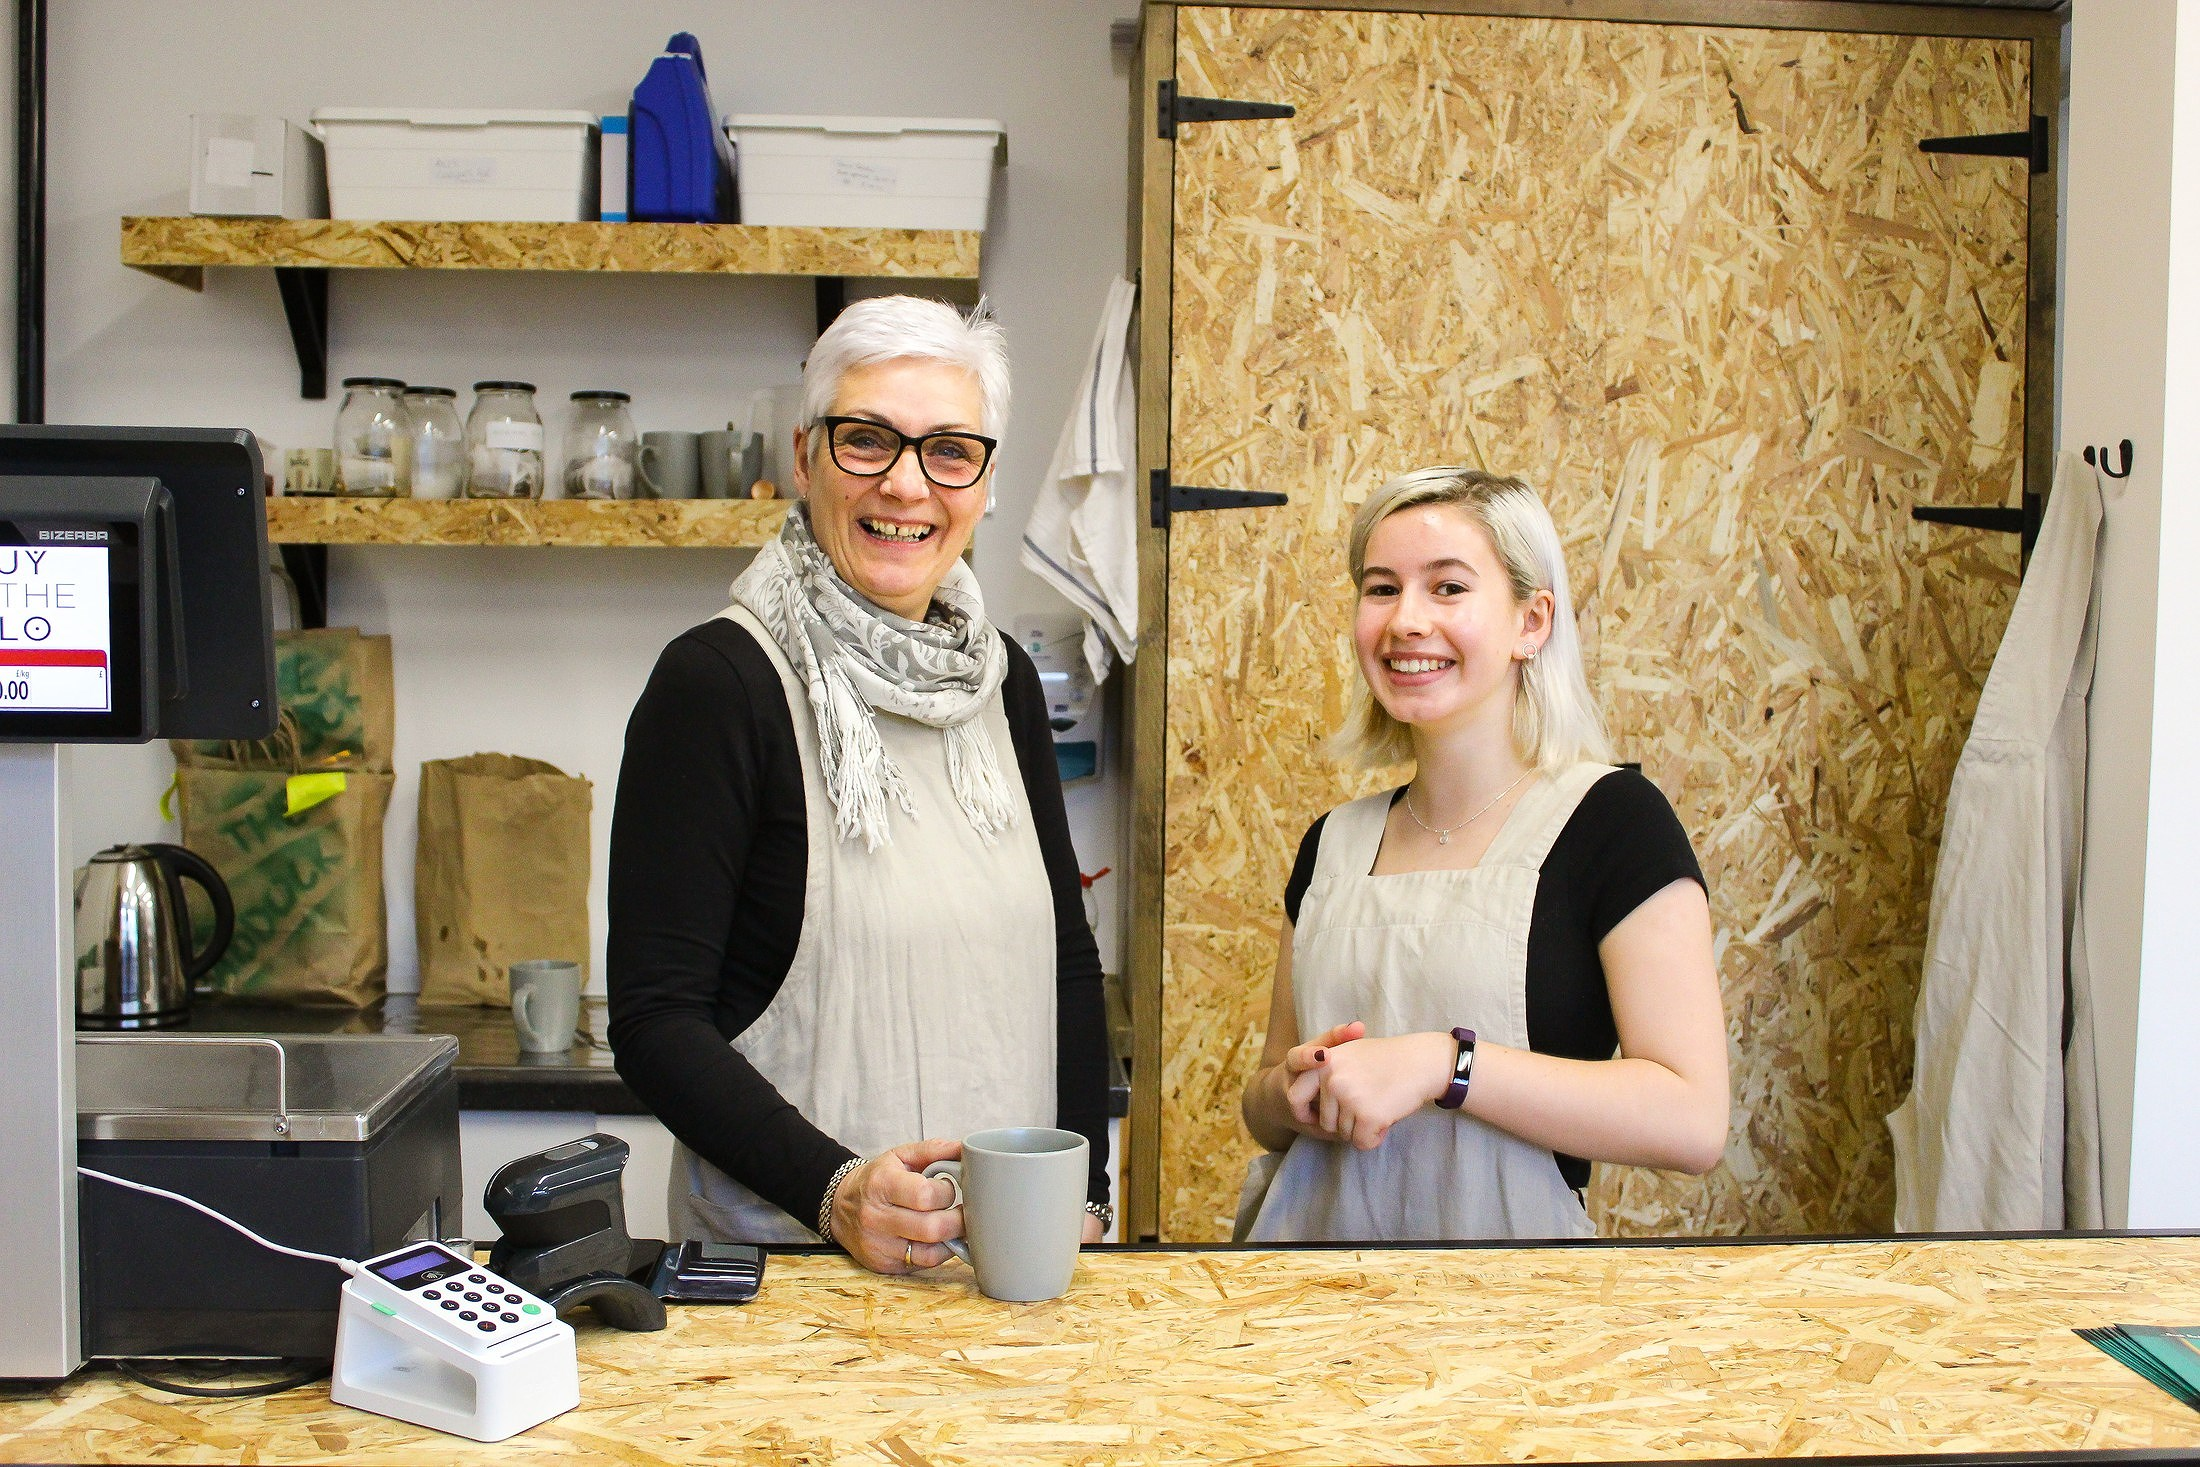 'Buy the Kilo' - A revolutionary Zero Waste Food Shop!